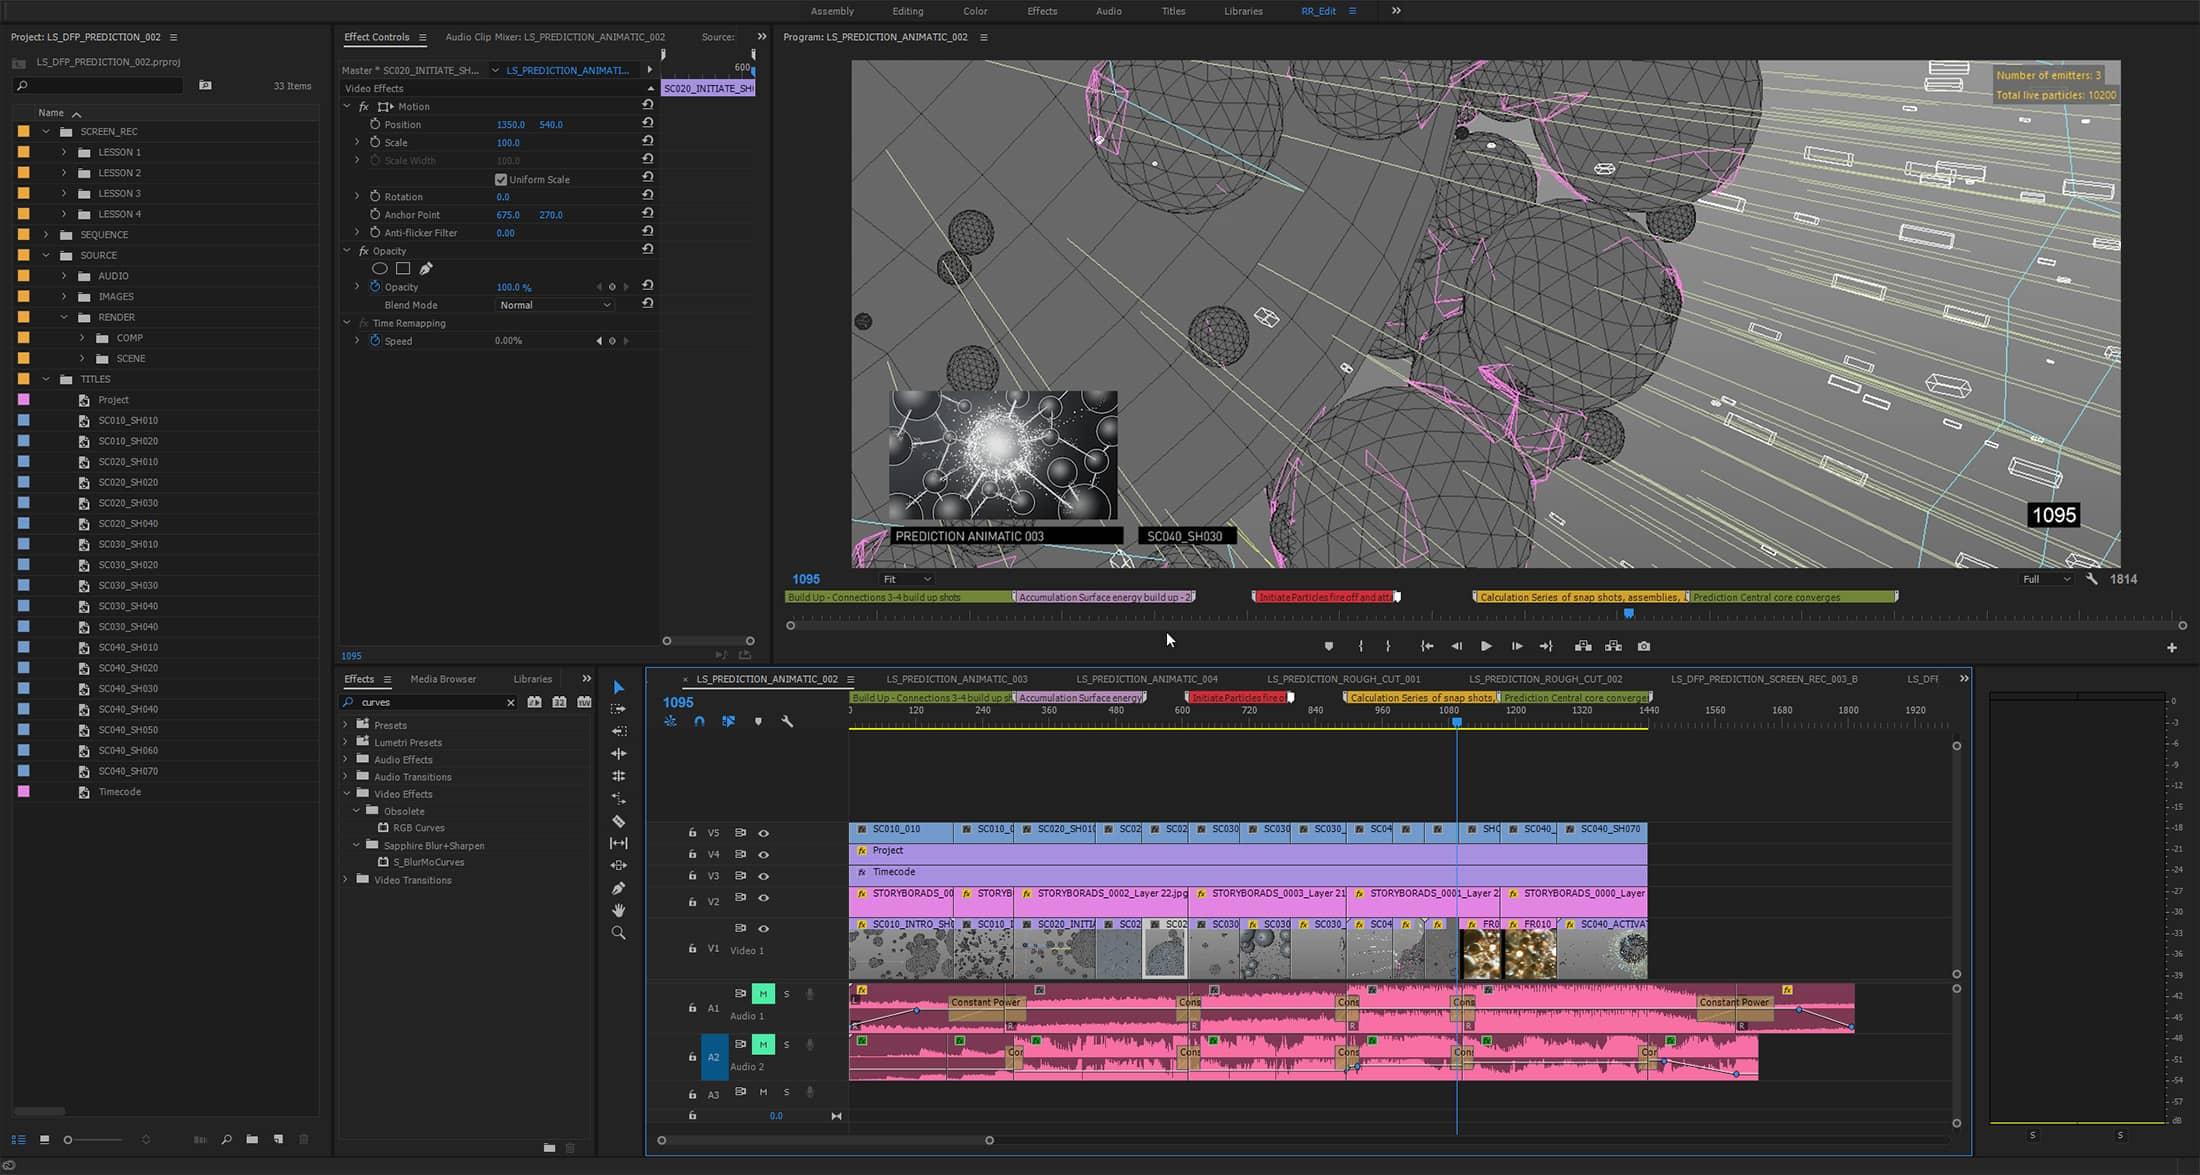 WEEK_02__0004_Adobe-Premiere-Pro_2017-05-08_10-10-31.png-min